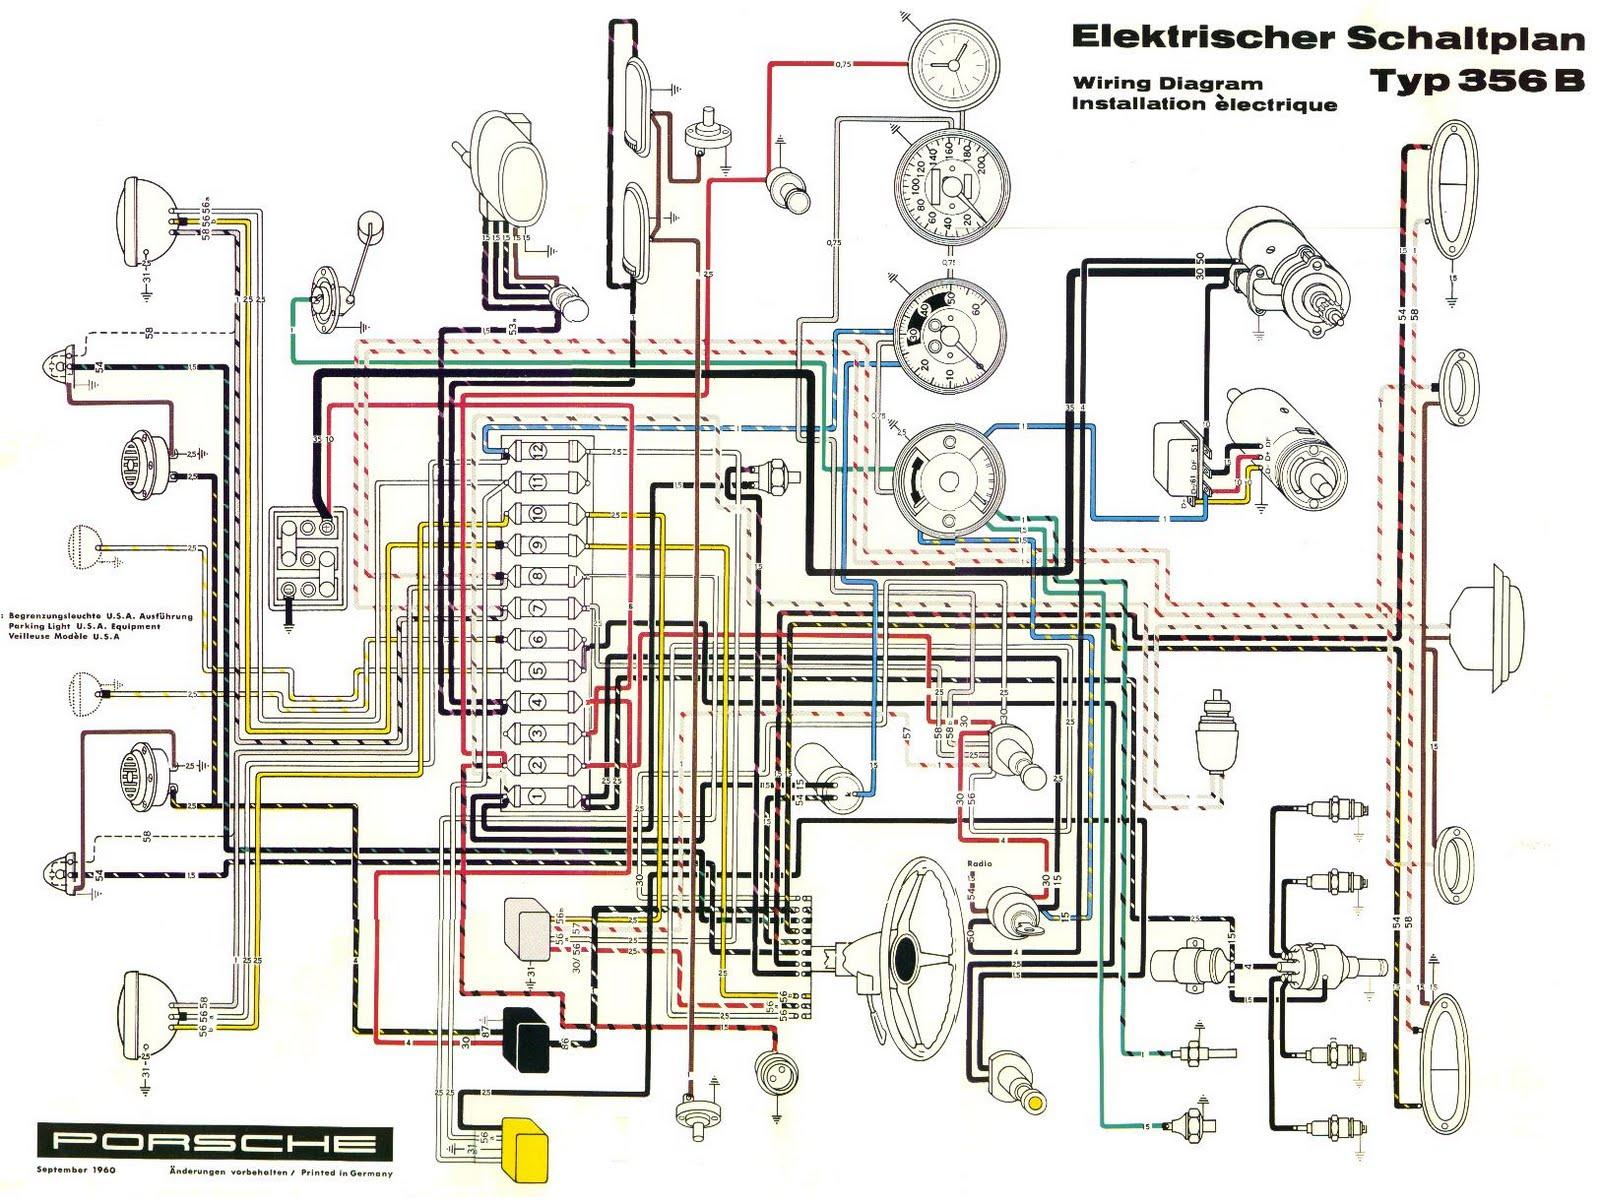 Ez Wiring Headlight Diagram Oil Pressure Sensor Wiring Harness – Ez Wiring Headlight Diagram